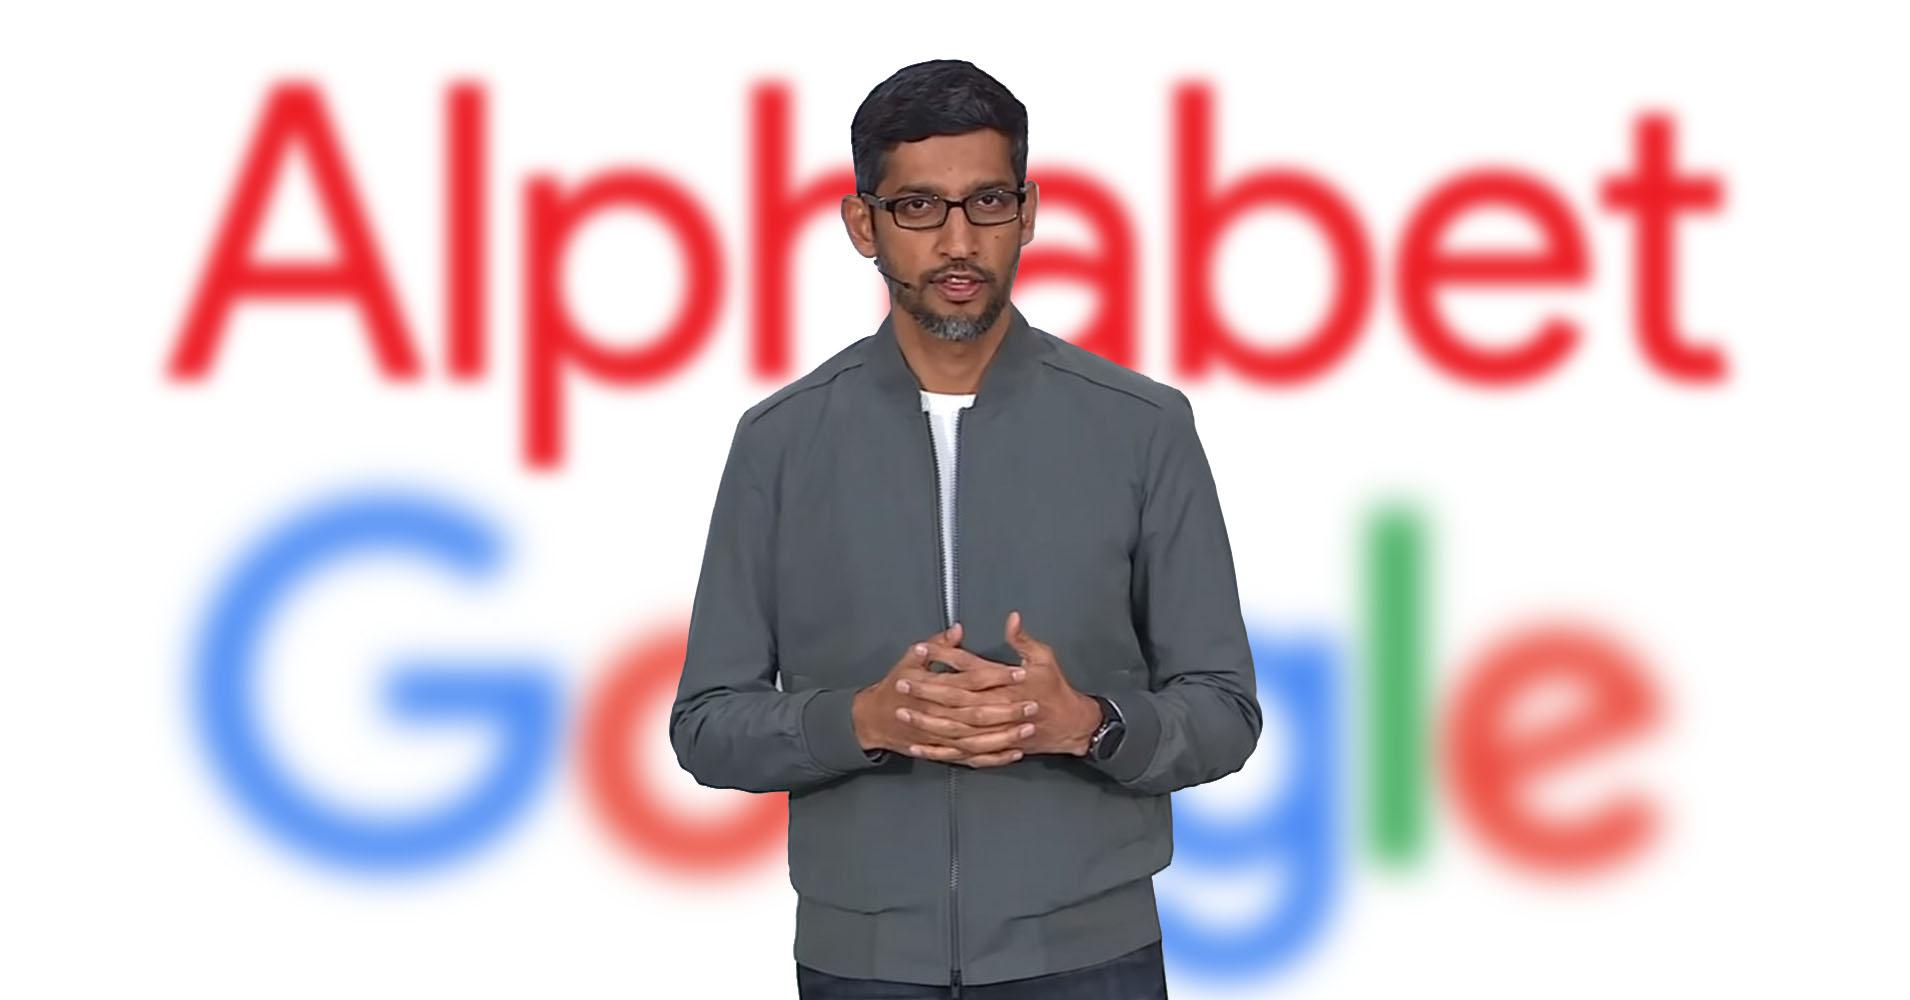 Alphabet joins the trillion dollar club